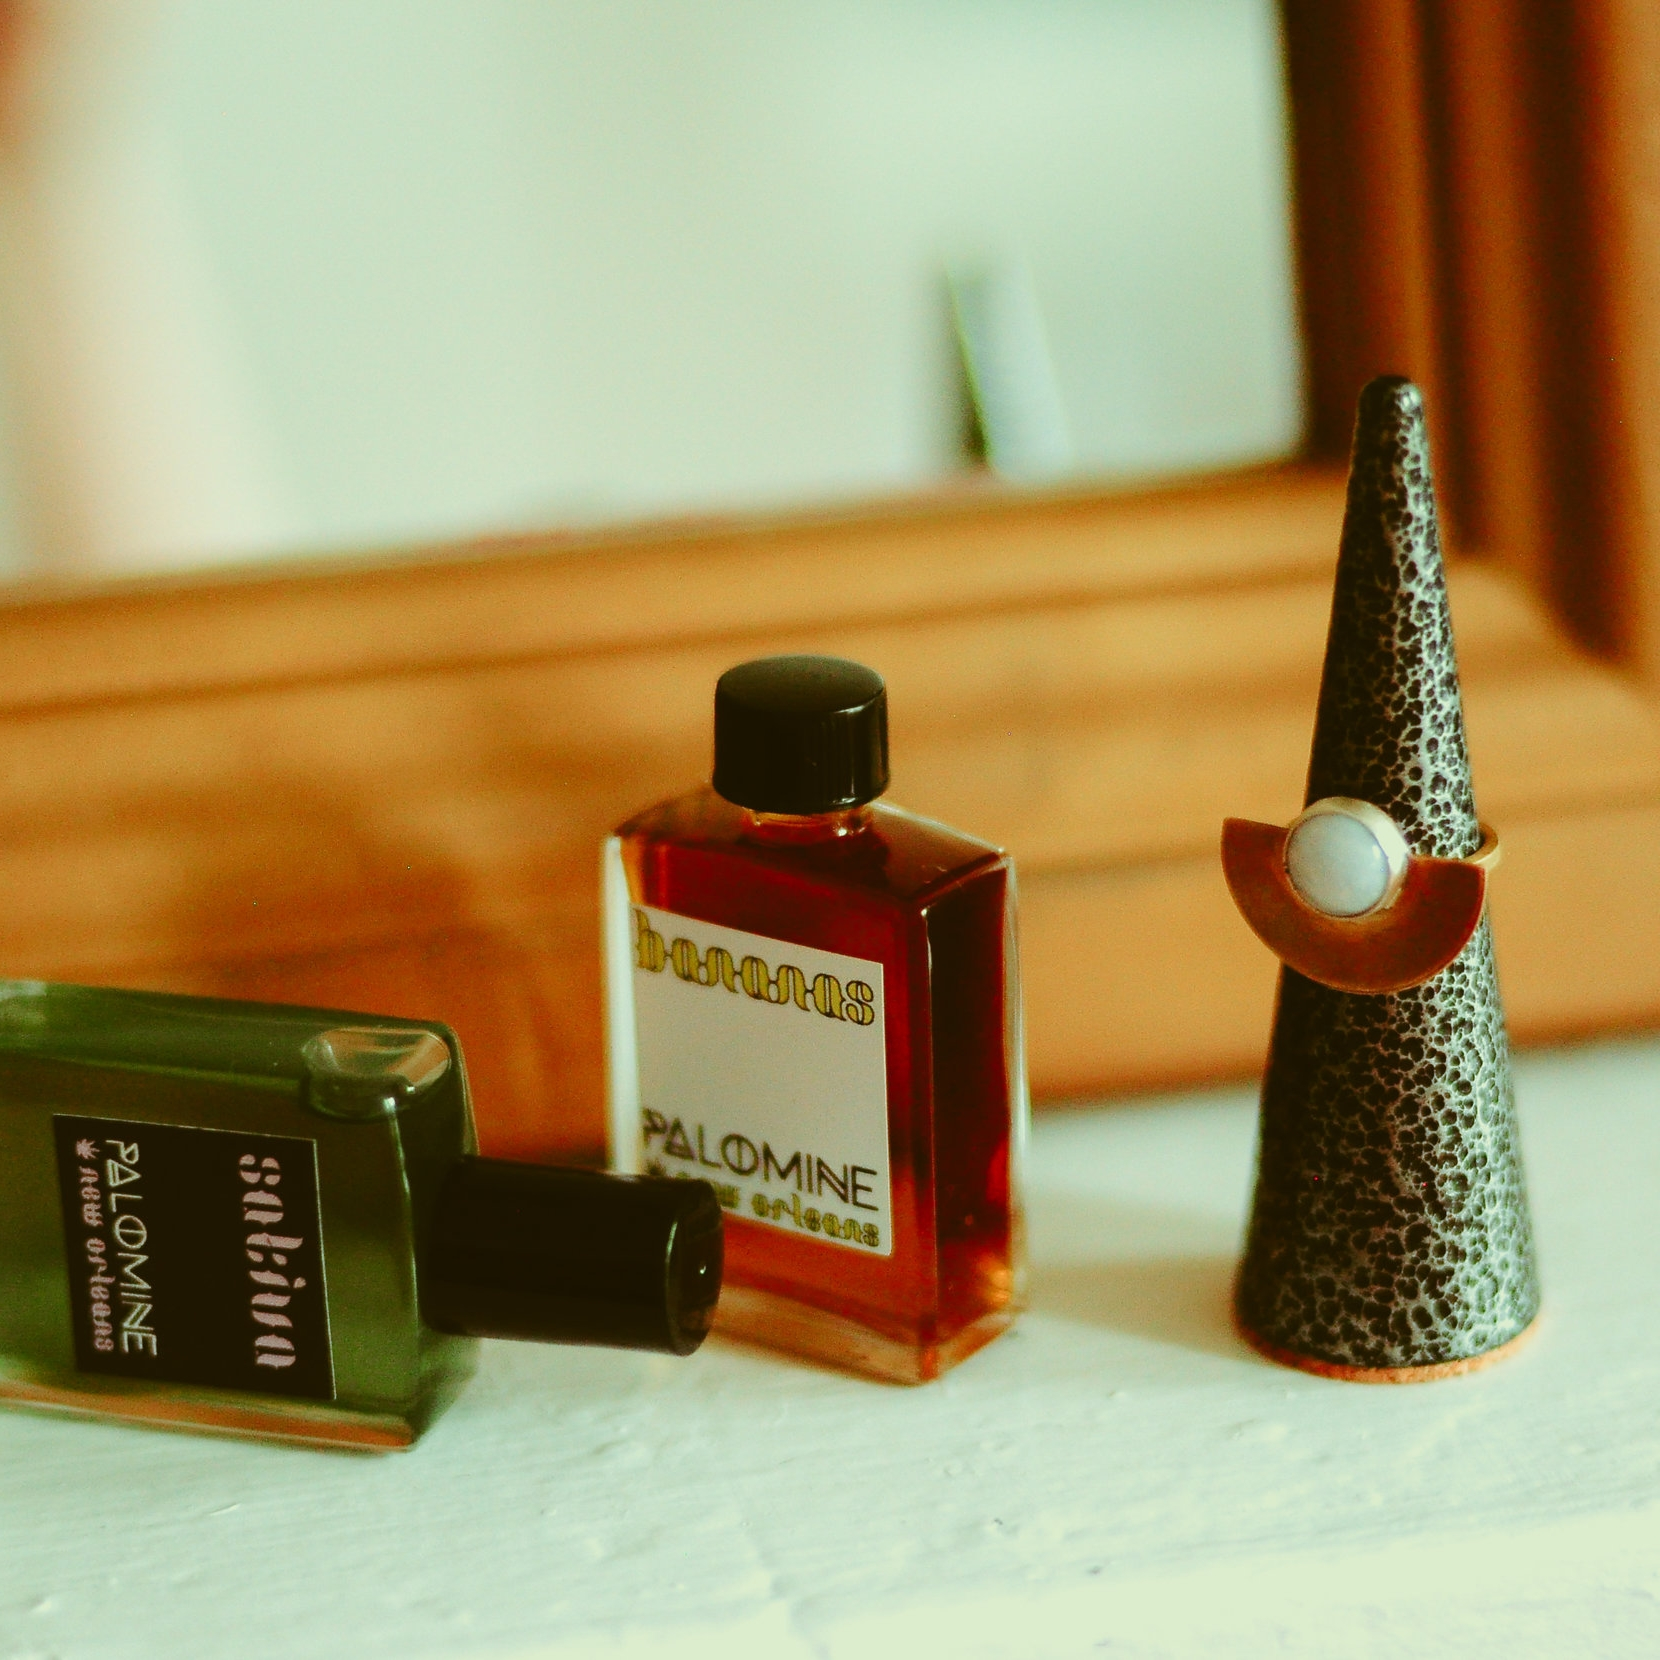 palomine-botanicals-handmade-new-orleans-perfume.jpg